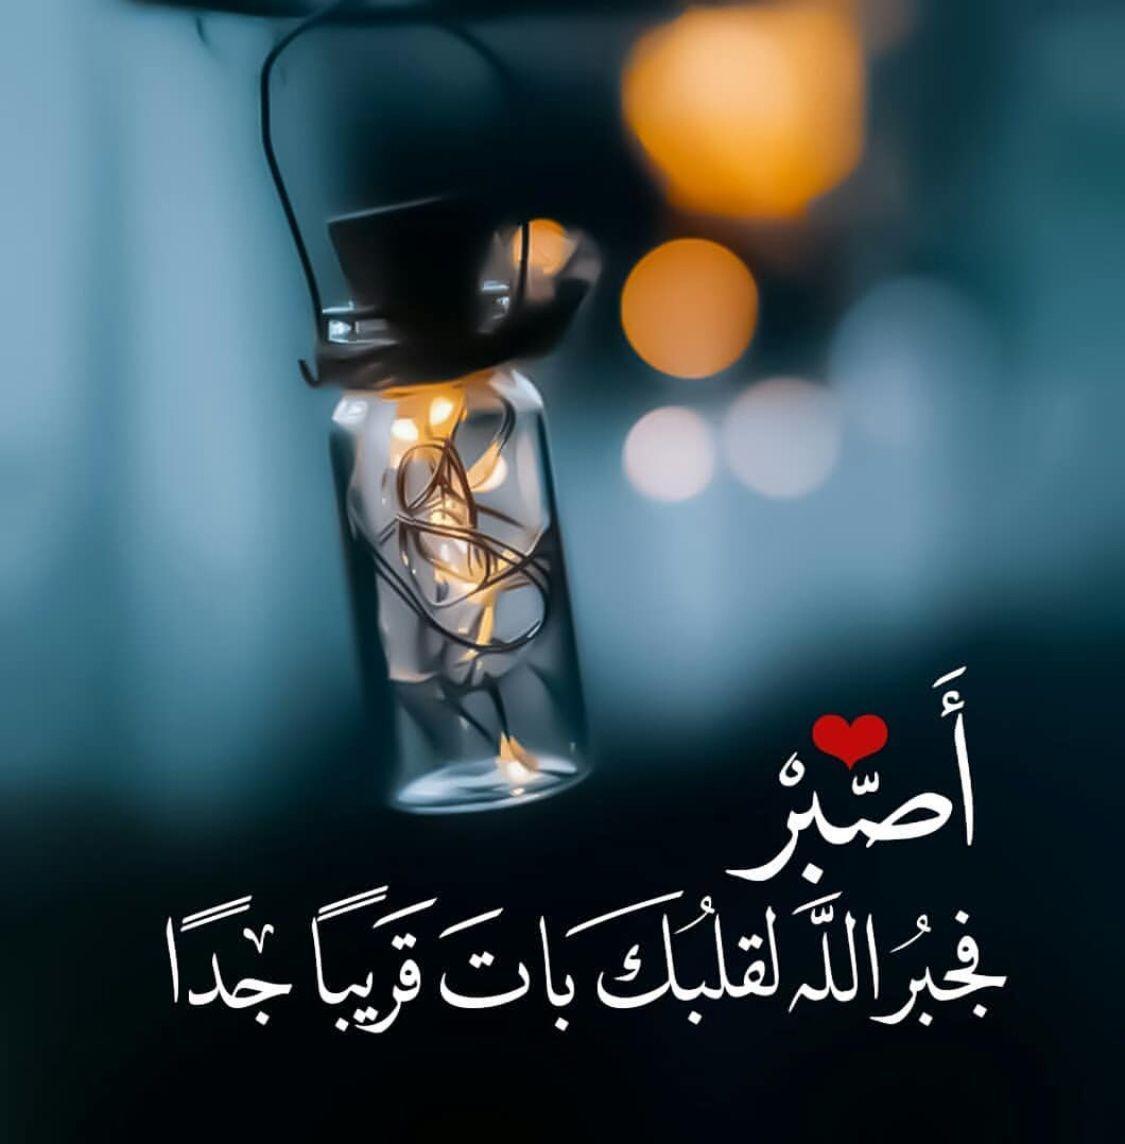 خواطر دينية قصيرة مزخرفة Cover Photo Quotes Cool Words Islamic Pictures